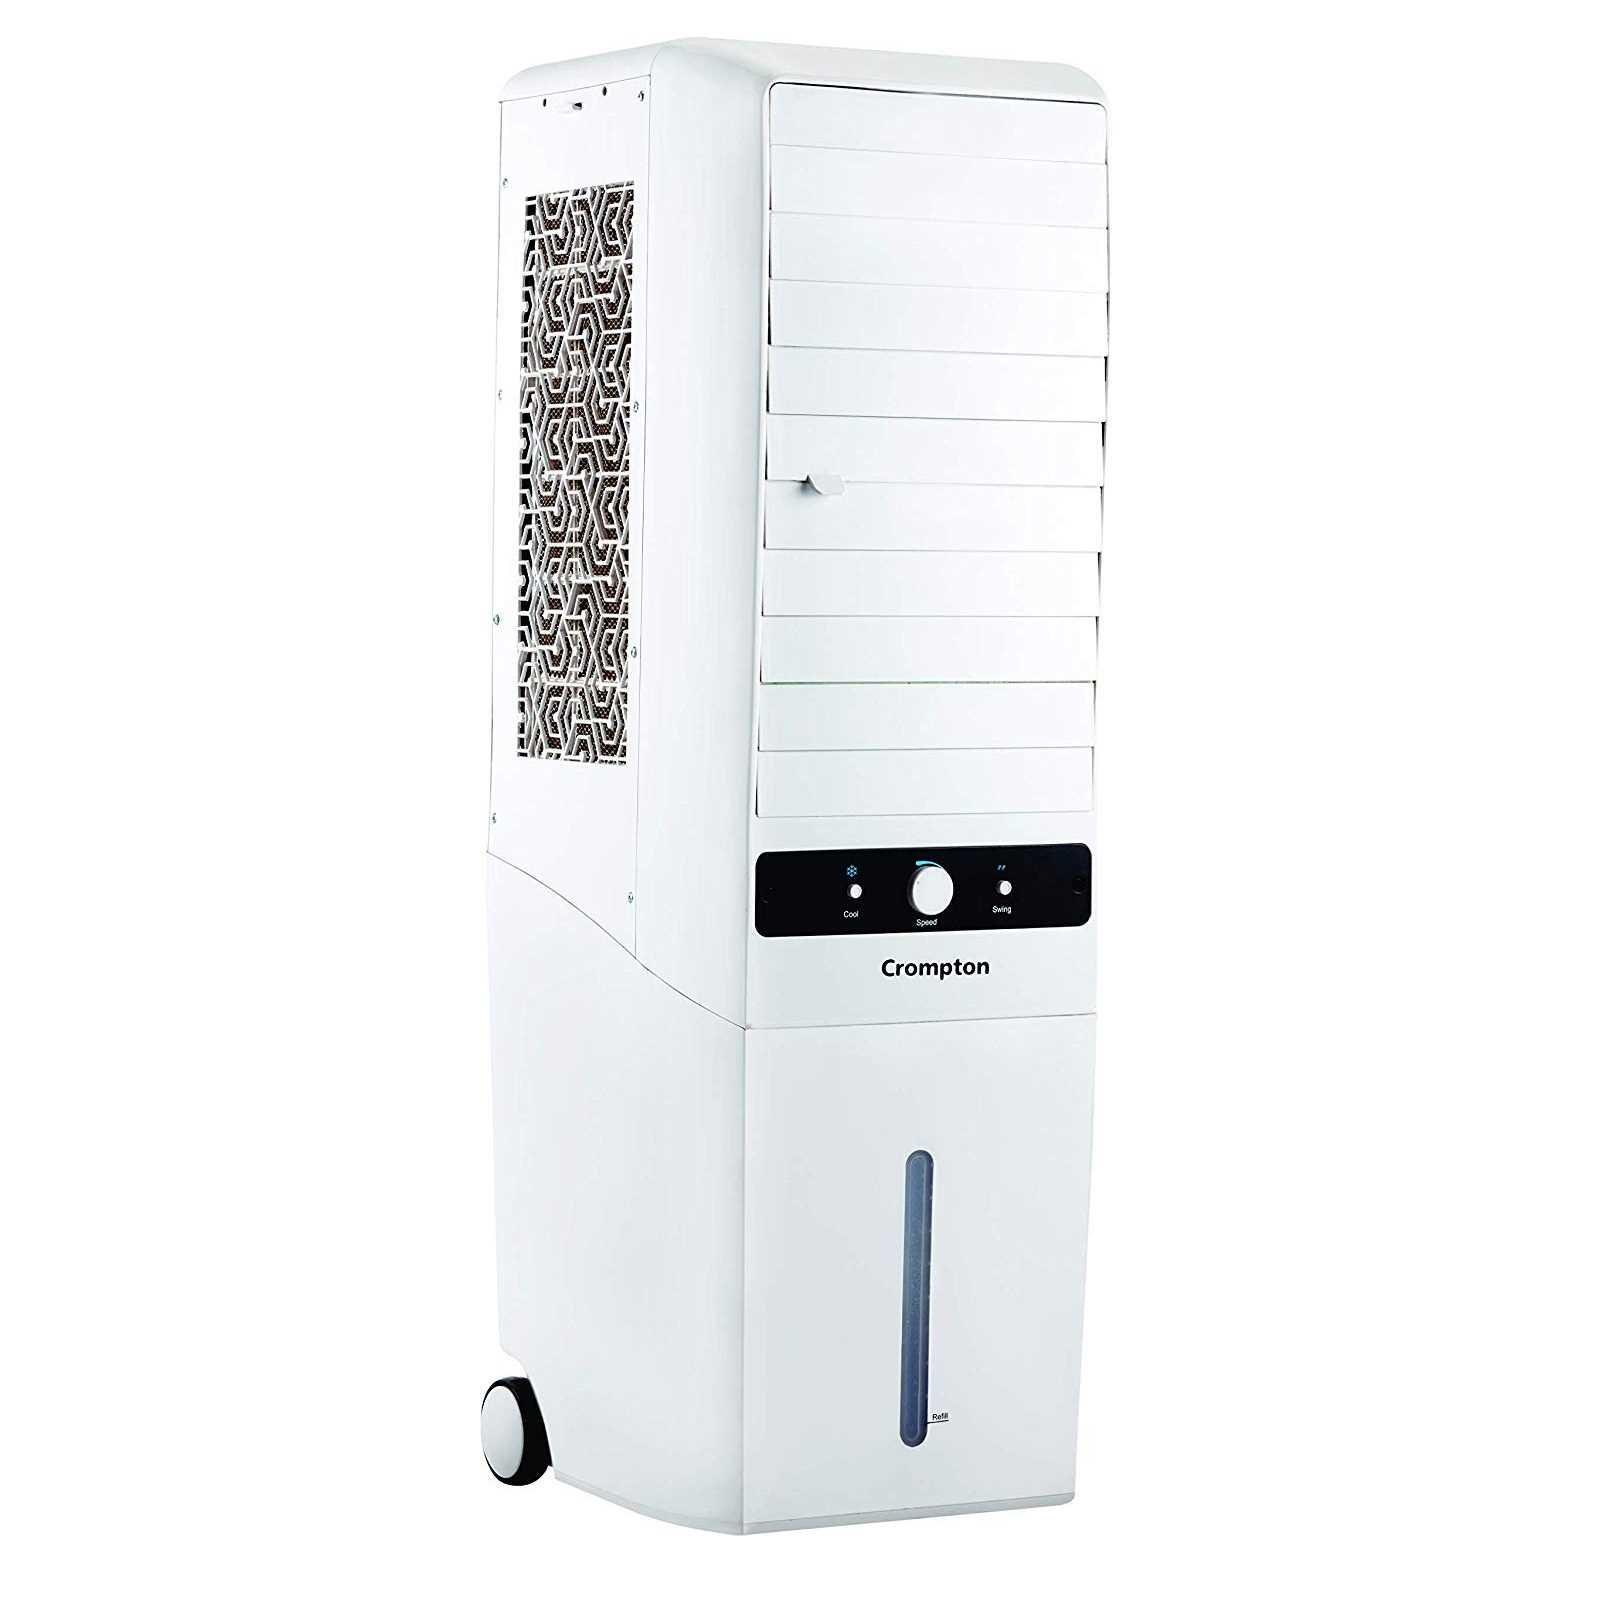 Crompton Mystique Turbo 34 Litre Tower Air Cooler